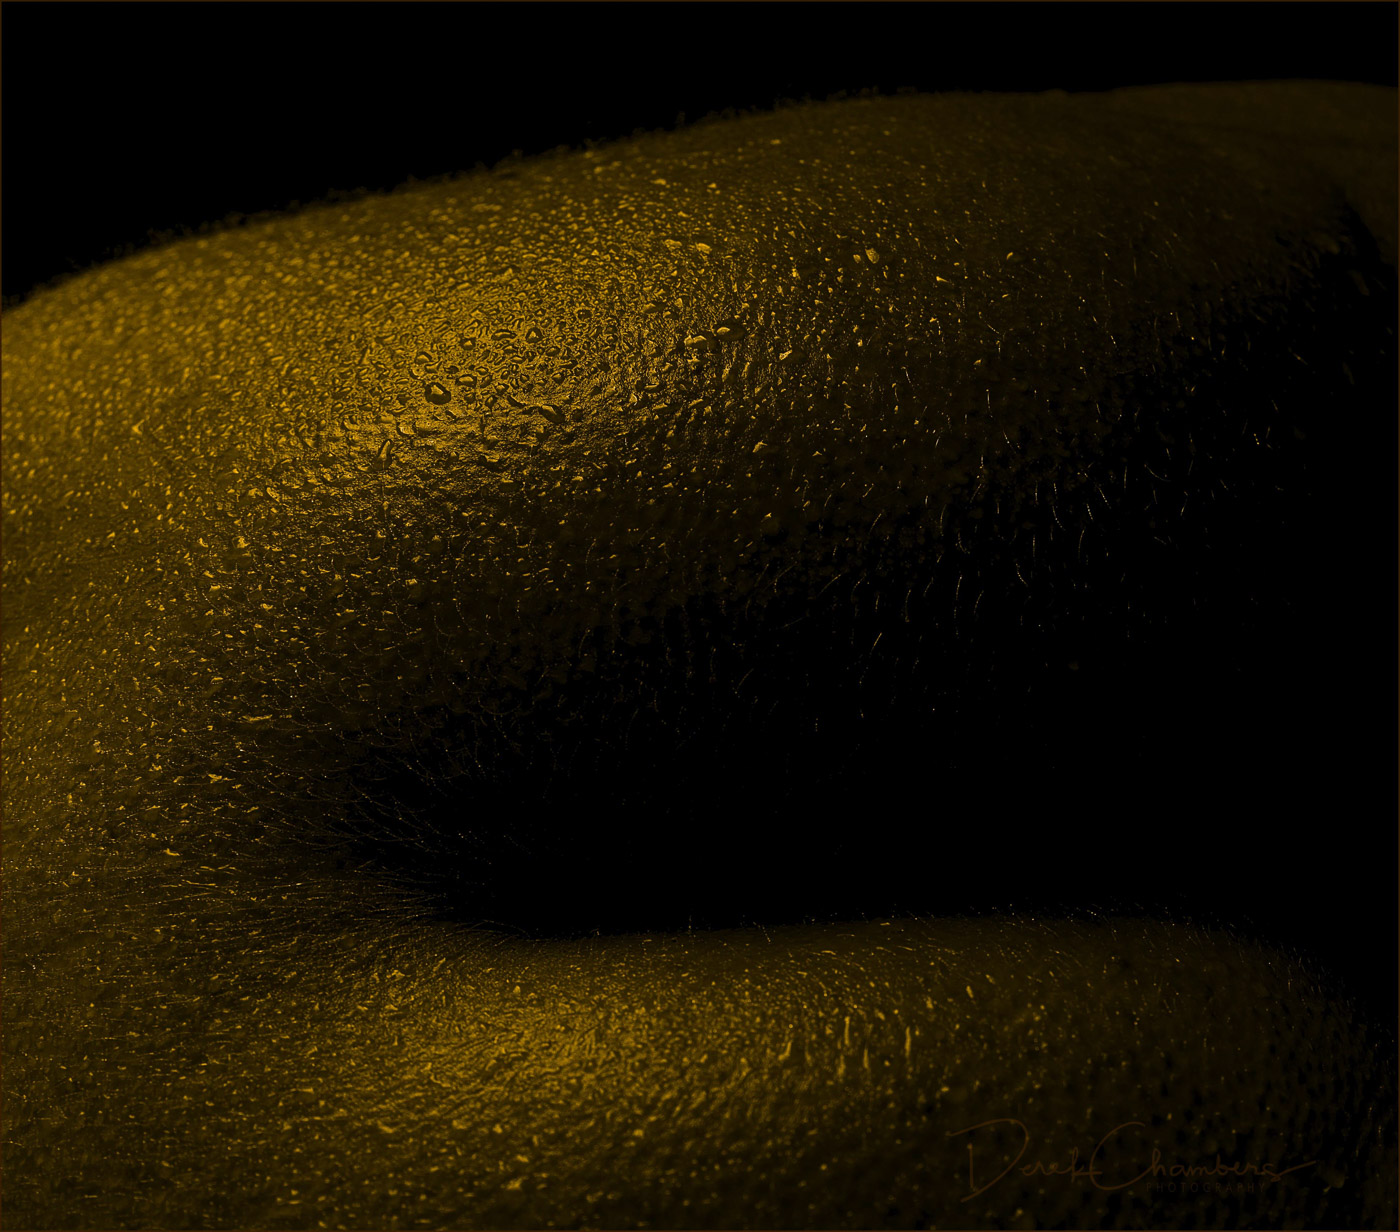 Golden Bodyscape - Derek Chambers